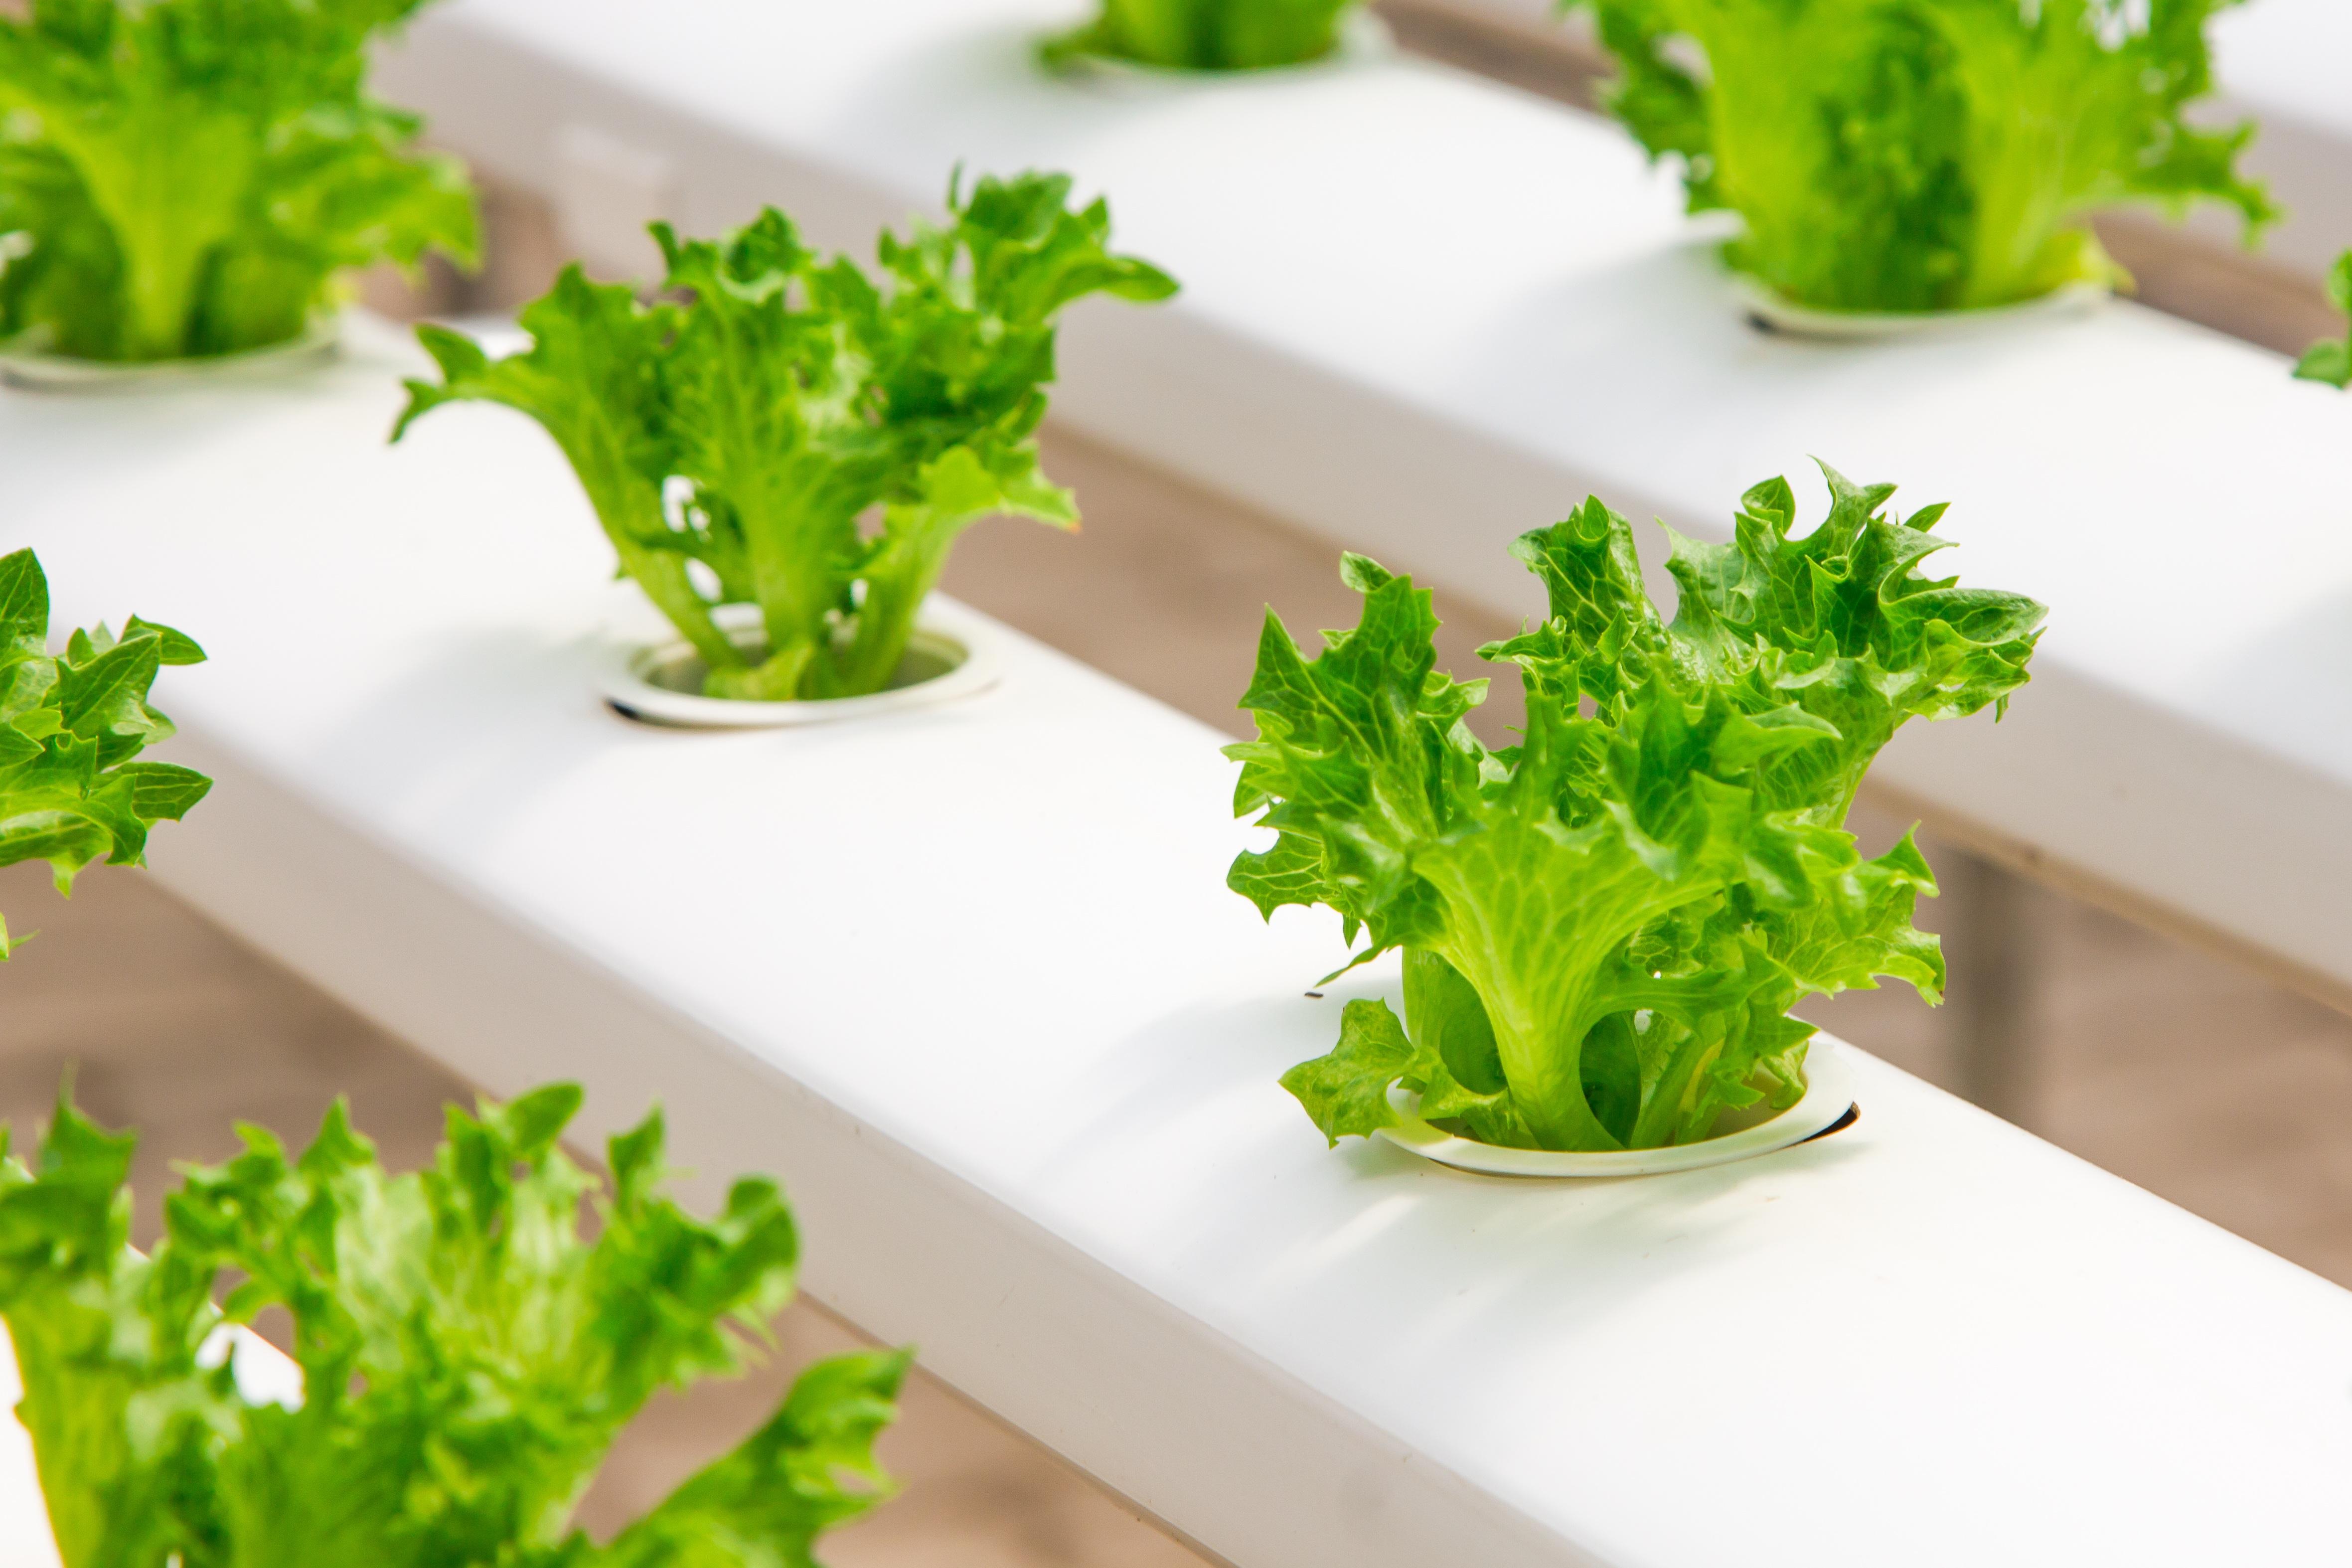 fresco industria jardn salud invernadero brcoli lechuga cultivo creciente pepino cultura orgnico plntulas hidropnico